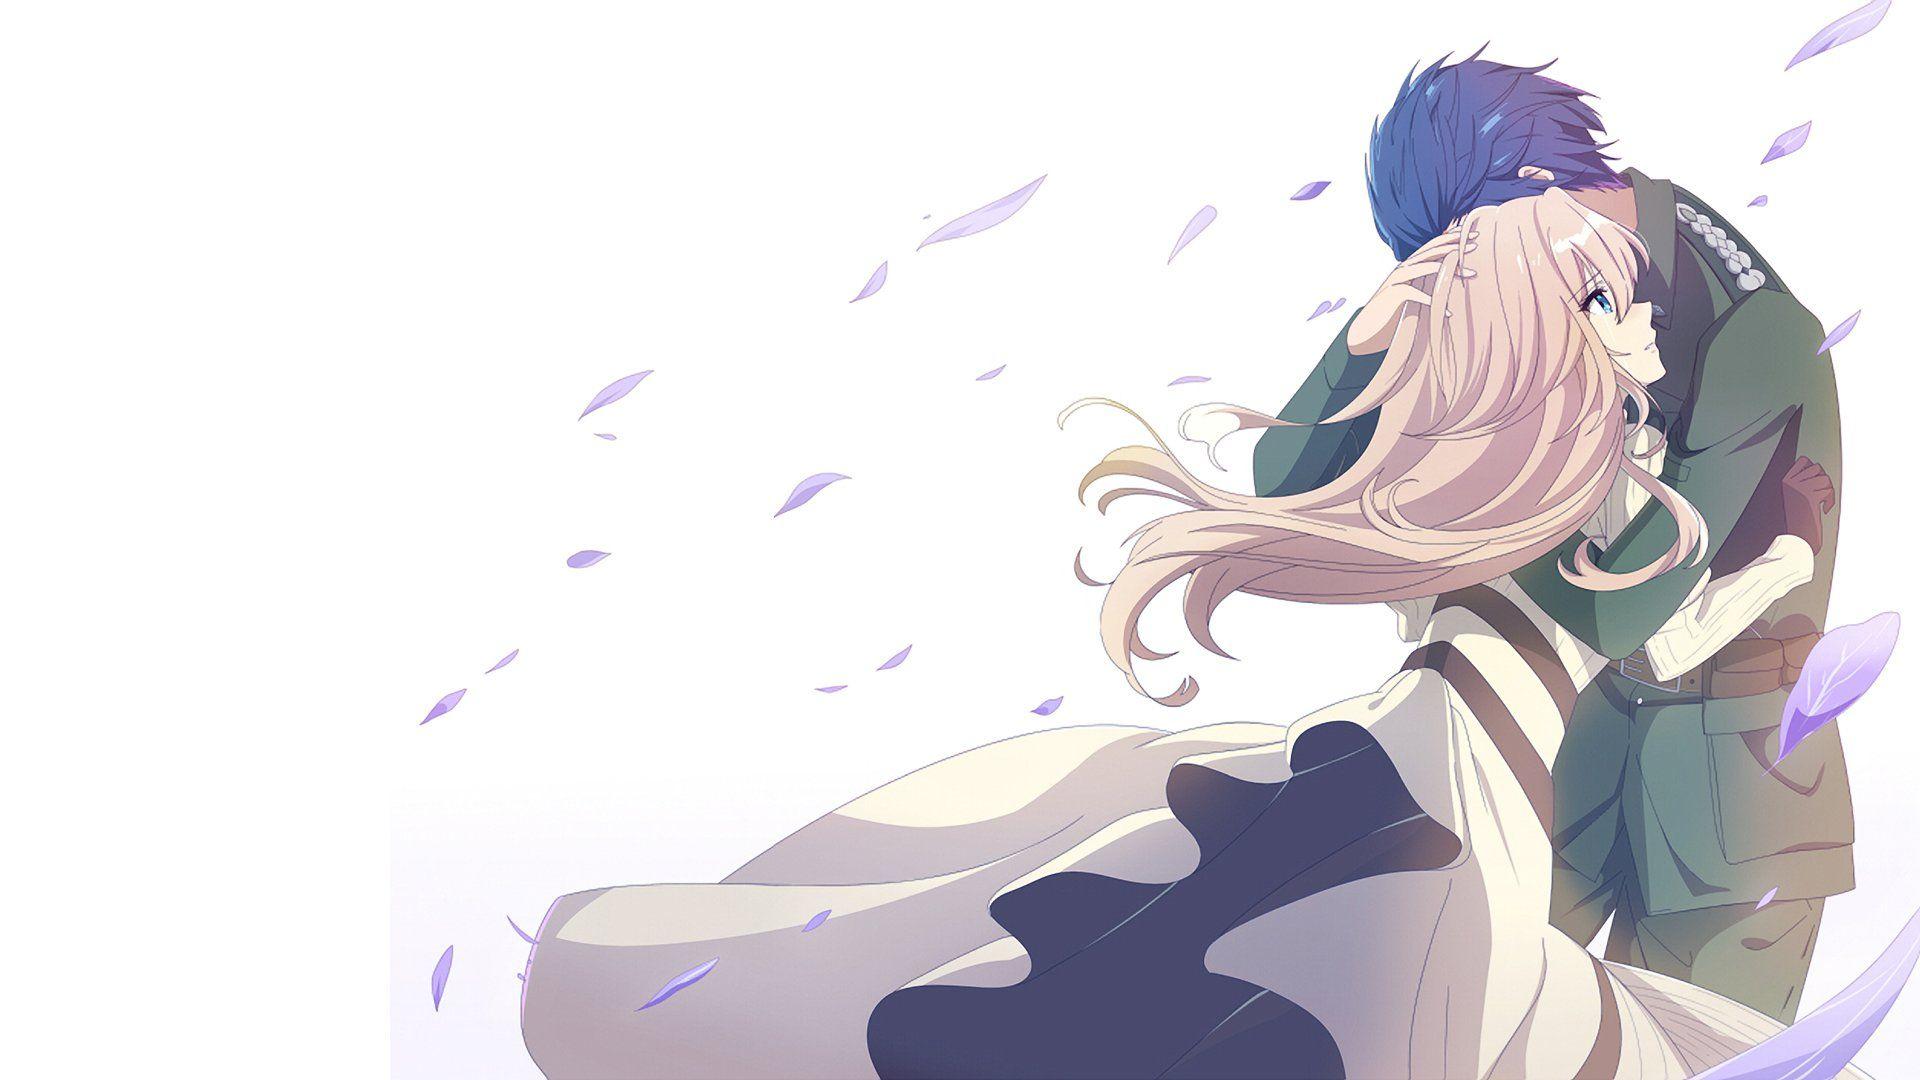 Anime violet evergarden violet evergarden character